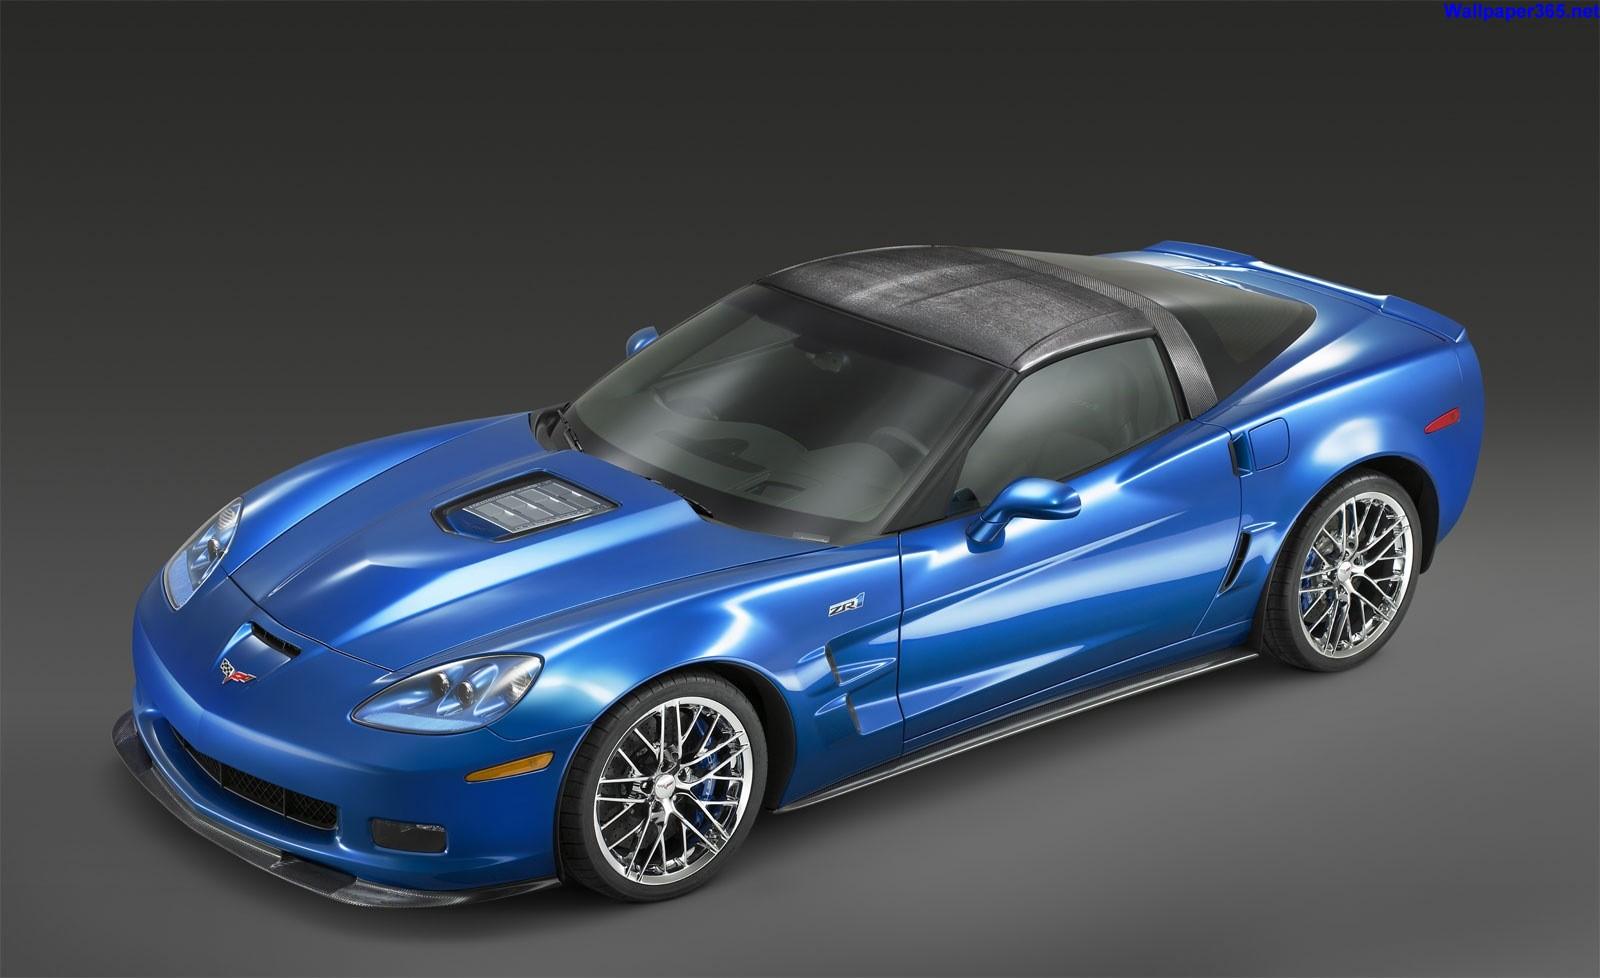 http://1.bp.blogspot.com/-pseJ2nTIkWE/TpzaFRfORFI/AAAAAAAAAes/1vQ46I1b5r8/s1600/Chevrolet+Corvette+%25289%2529.jpg